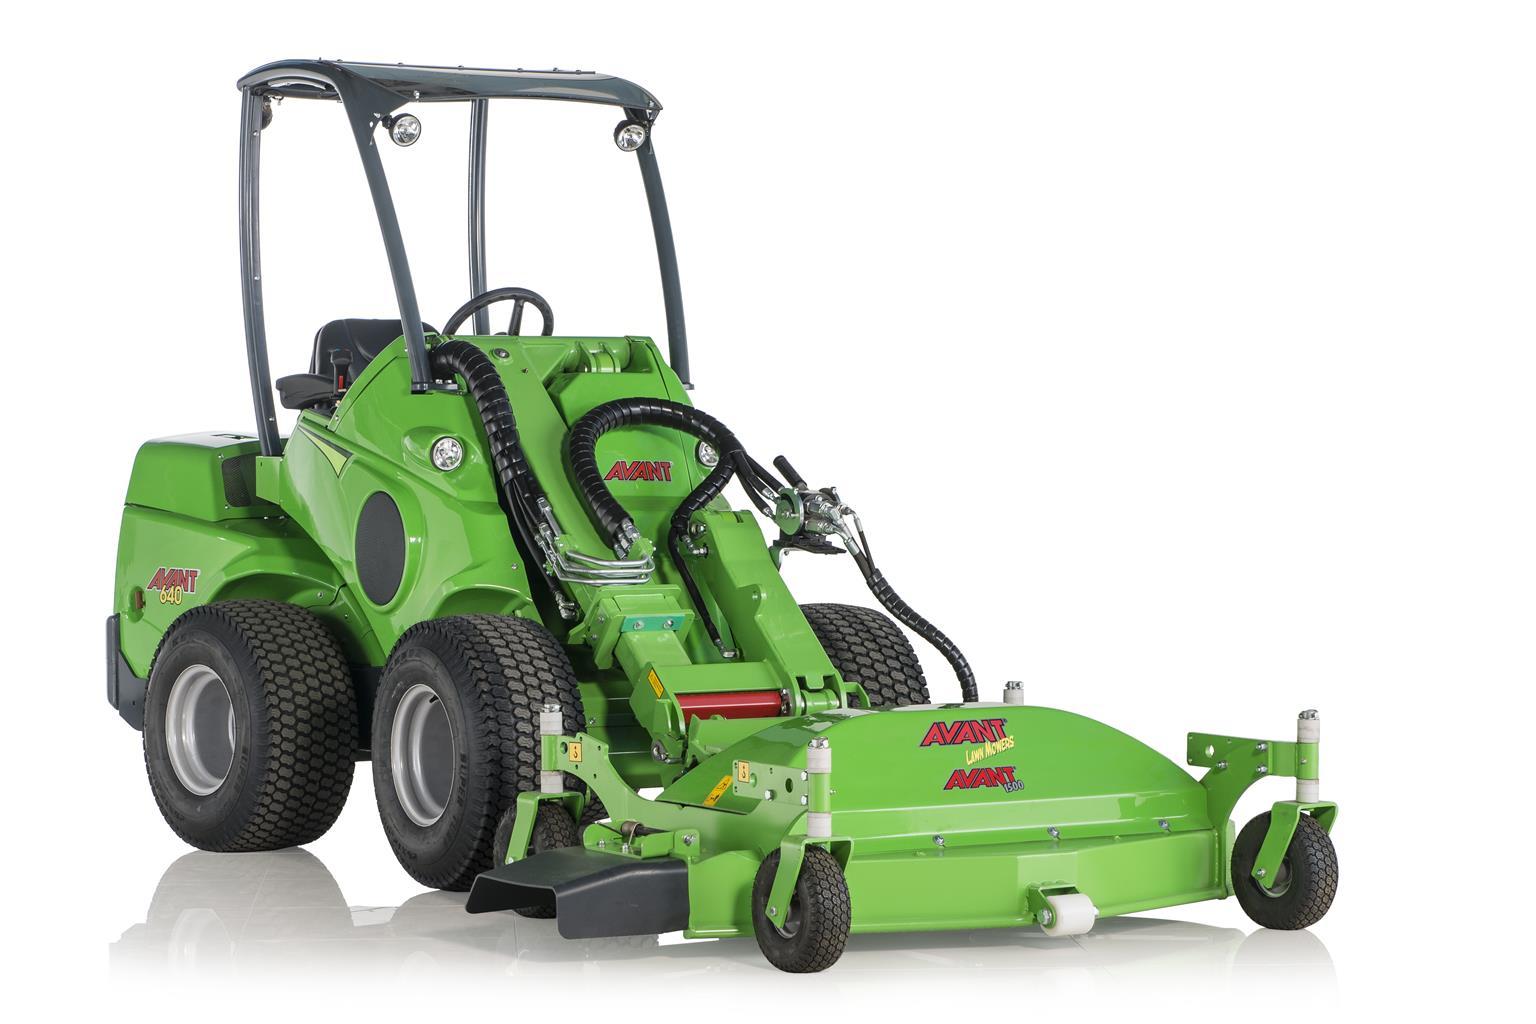 Avant 630 –Mini loader/digger/tractor/ excavator/trencher/forklift/articulated